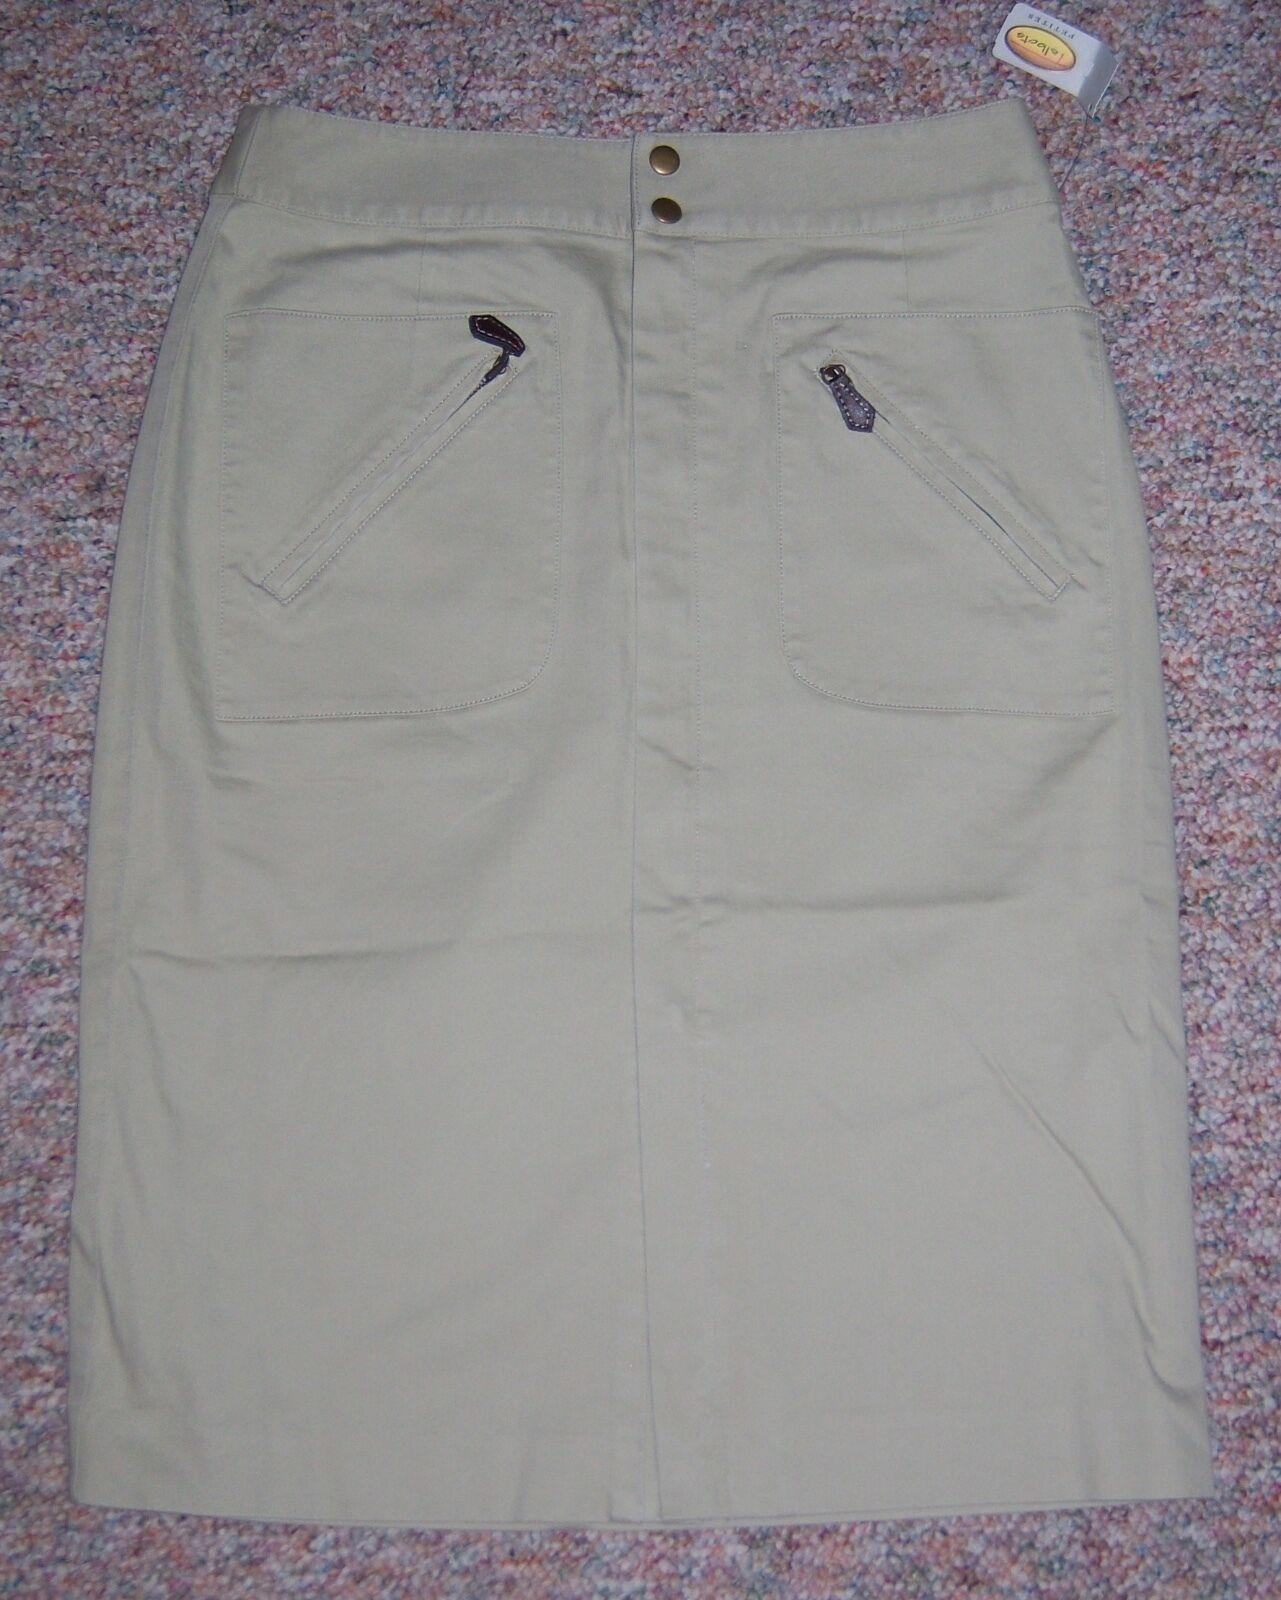 TALBOTS Tan A-Line Long Below the Knee Dress Skirt Size 6P